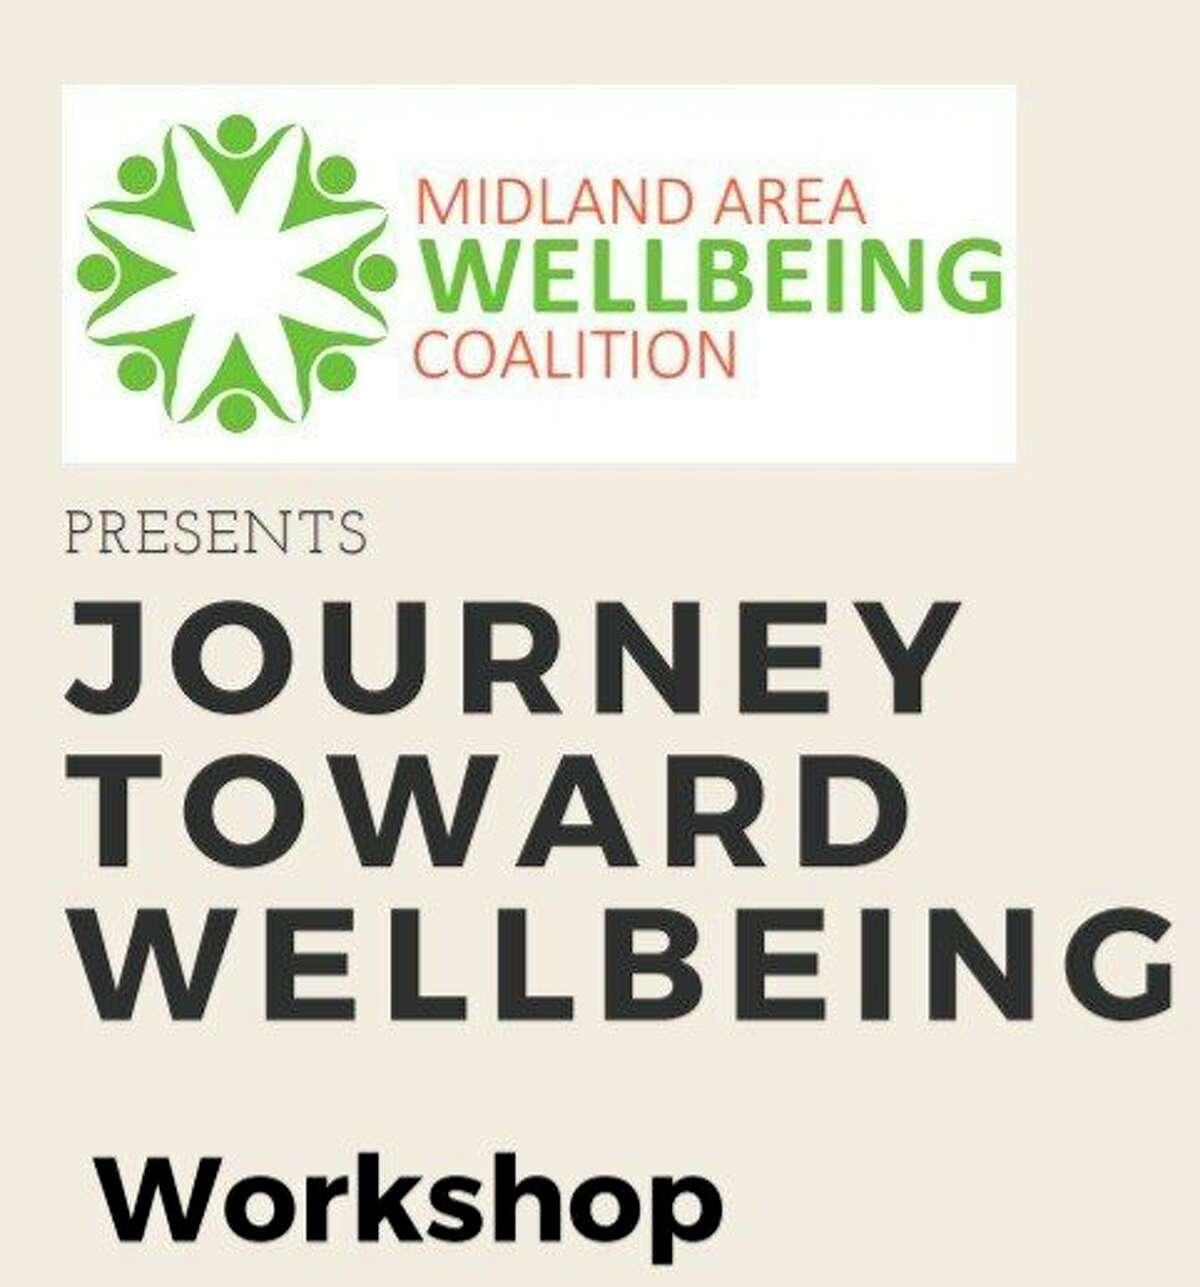 This week: Midland Area Wellbeing Coalition has set Journey Toward Wellbeing community workshopsat various times throughout the week. (Screenshot/Midland Area Wellbeing Coalition)